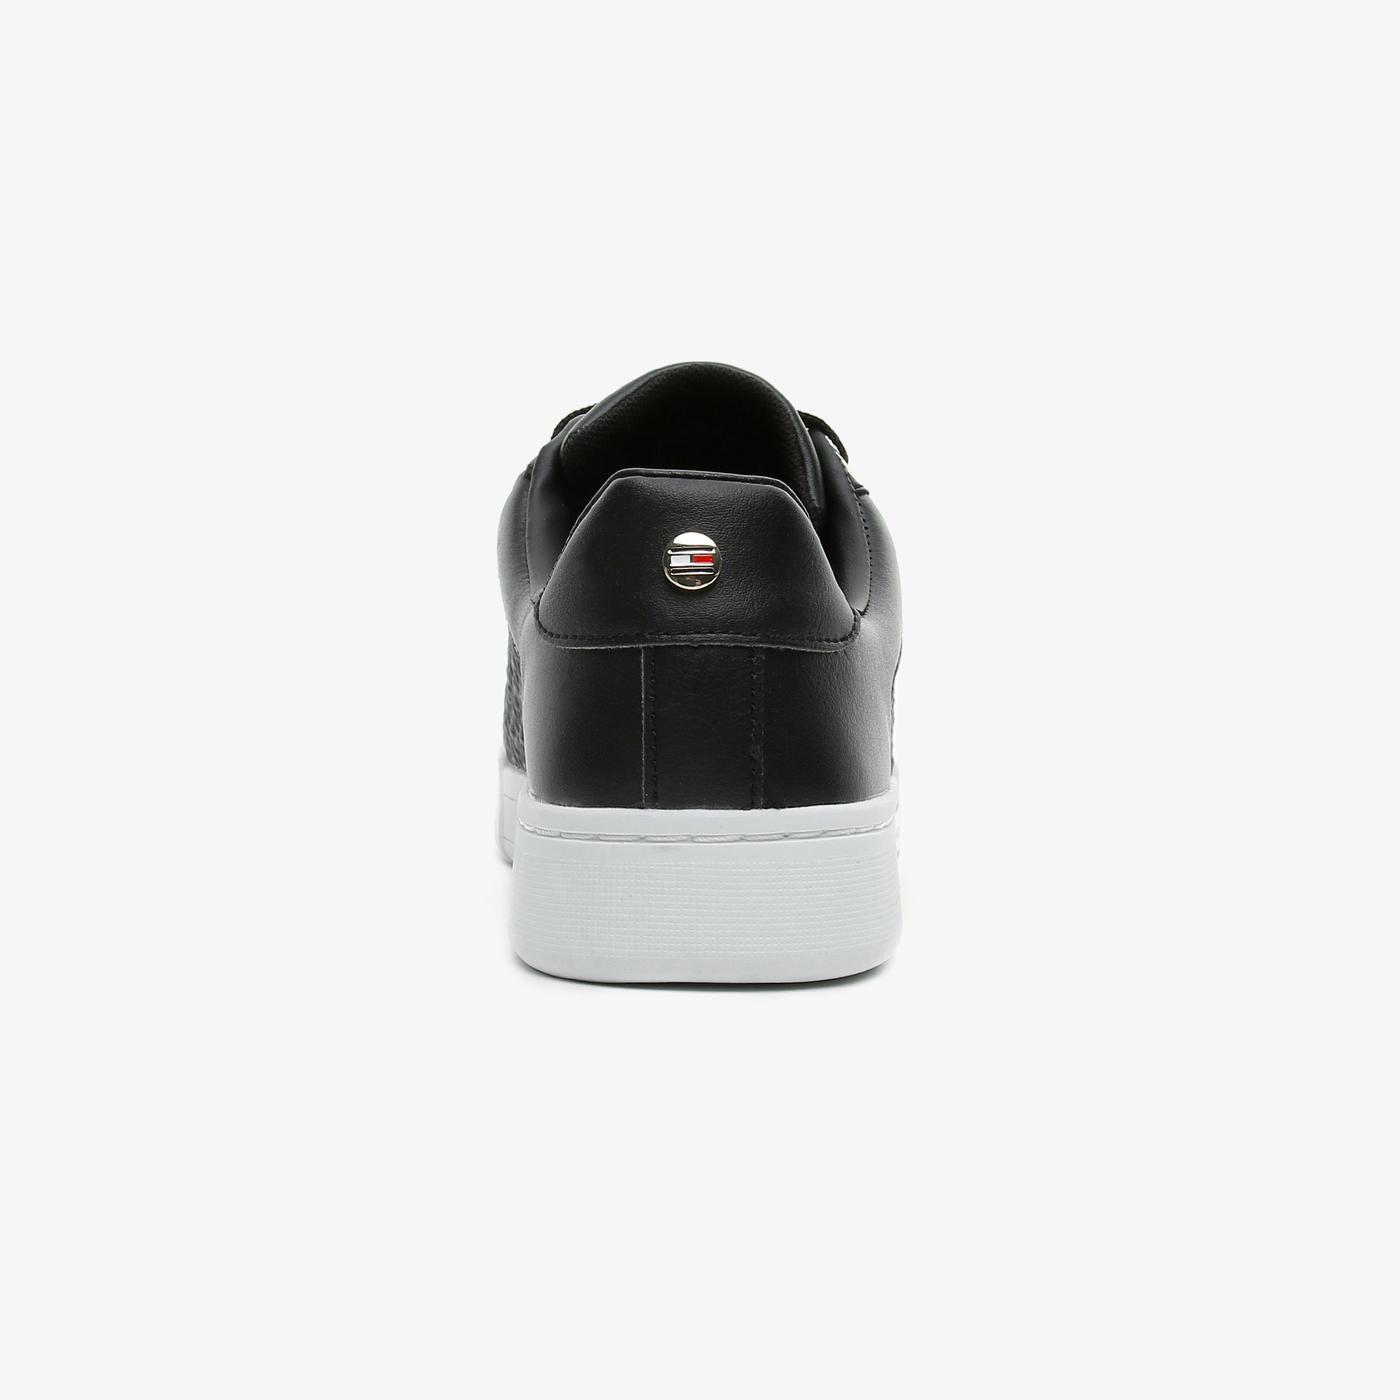 Tommy Hilfiger Monogram Elevated Kadın Siyah Spor Ayakkabı